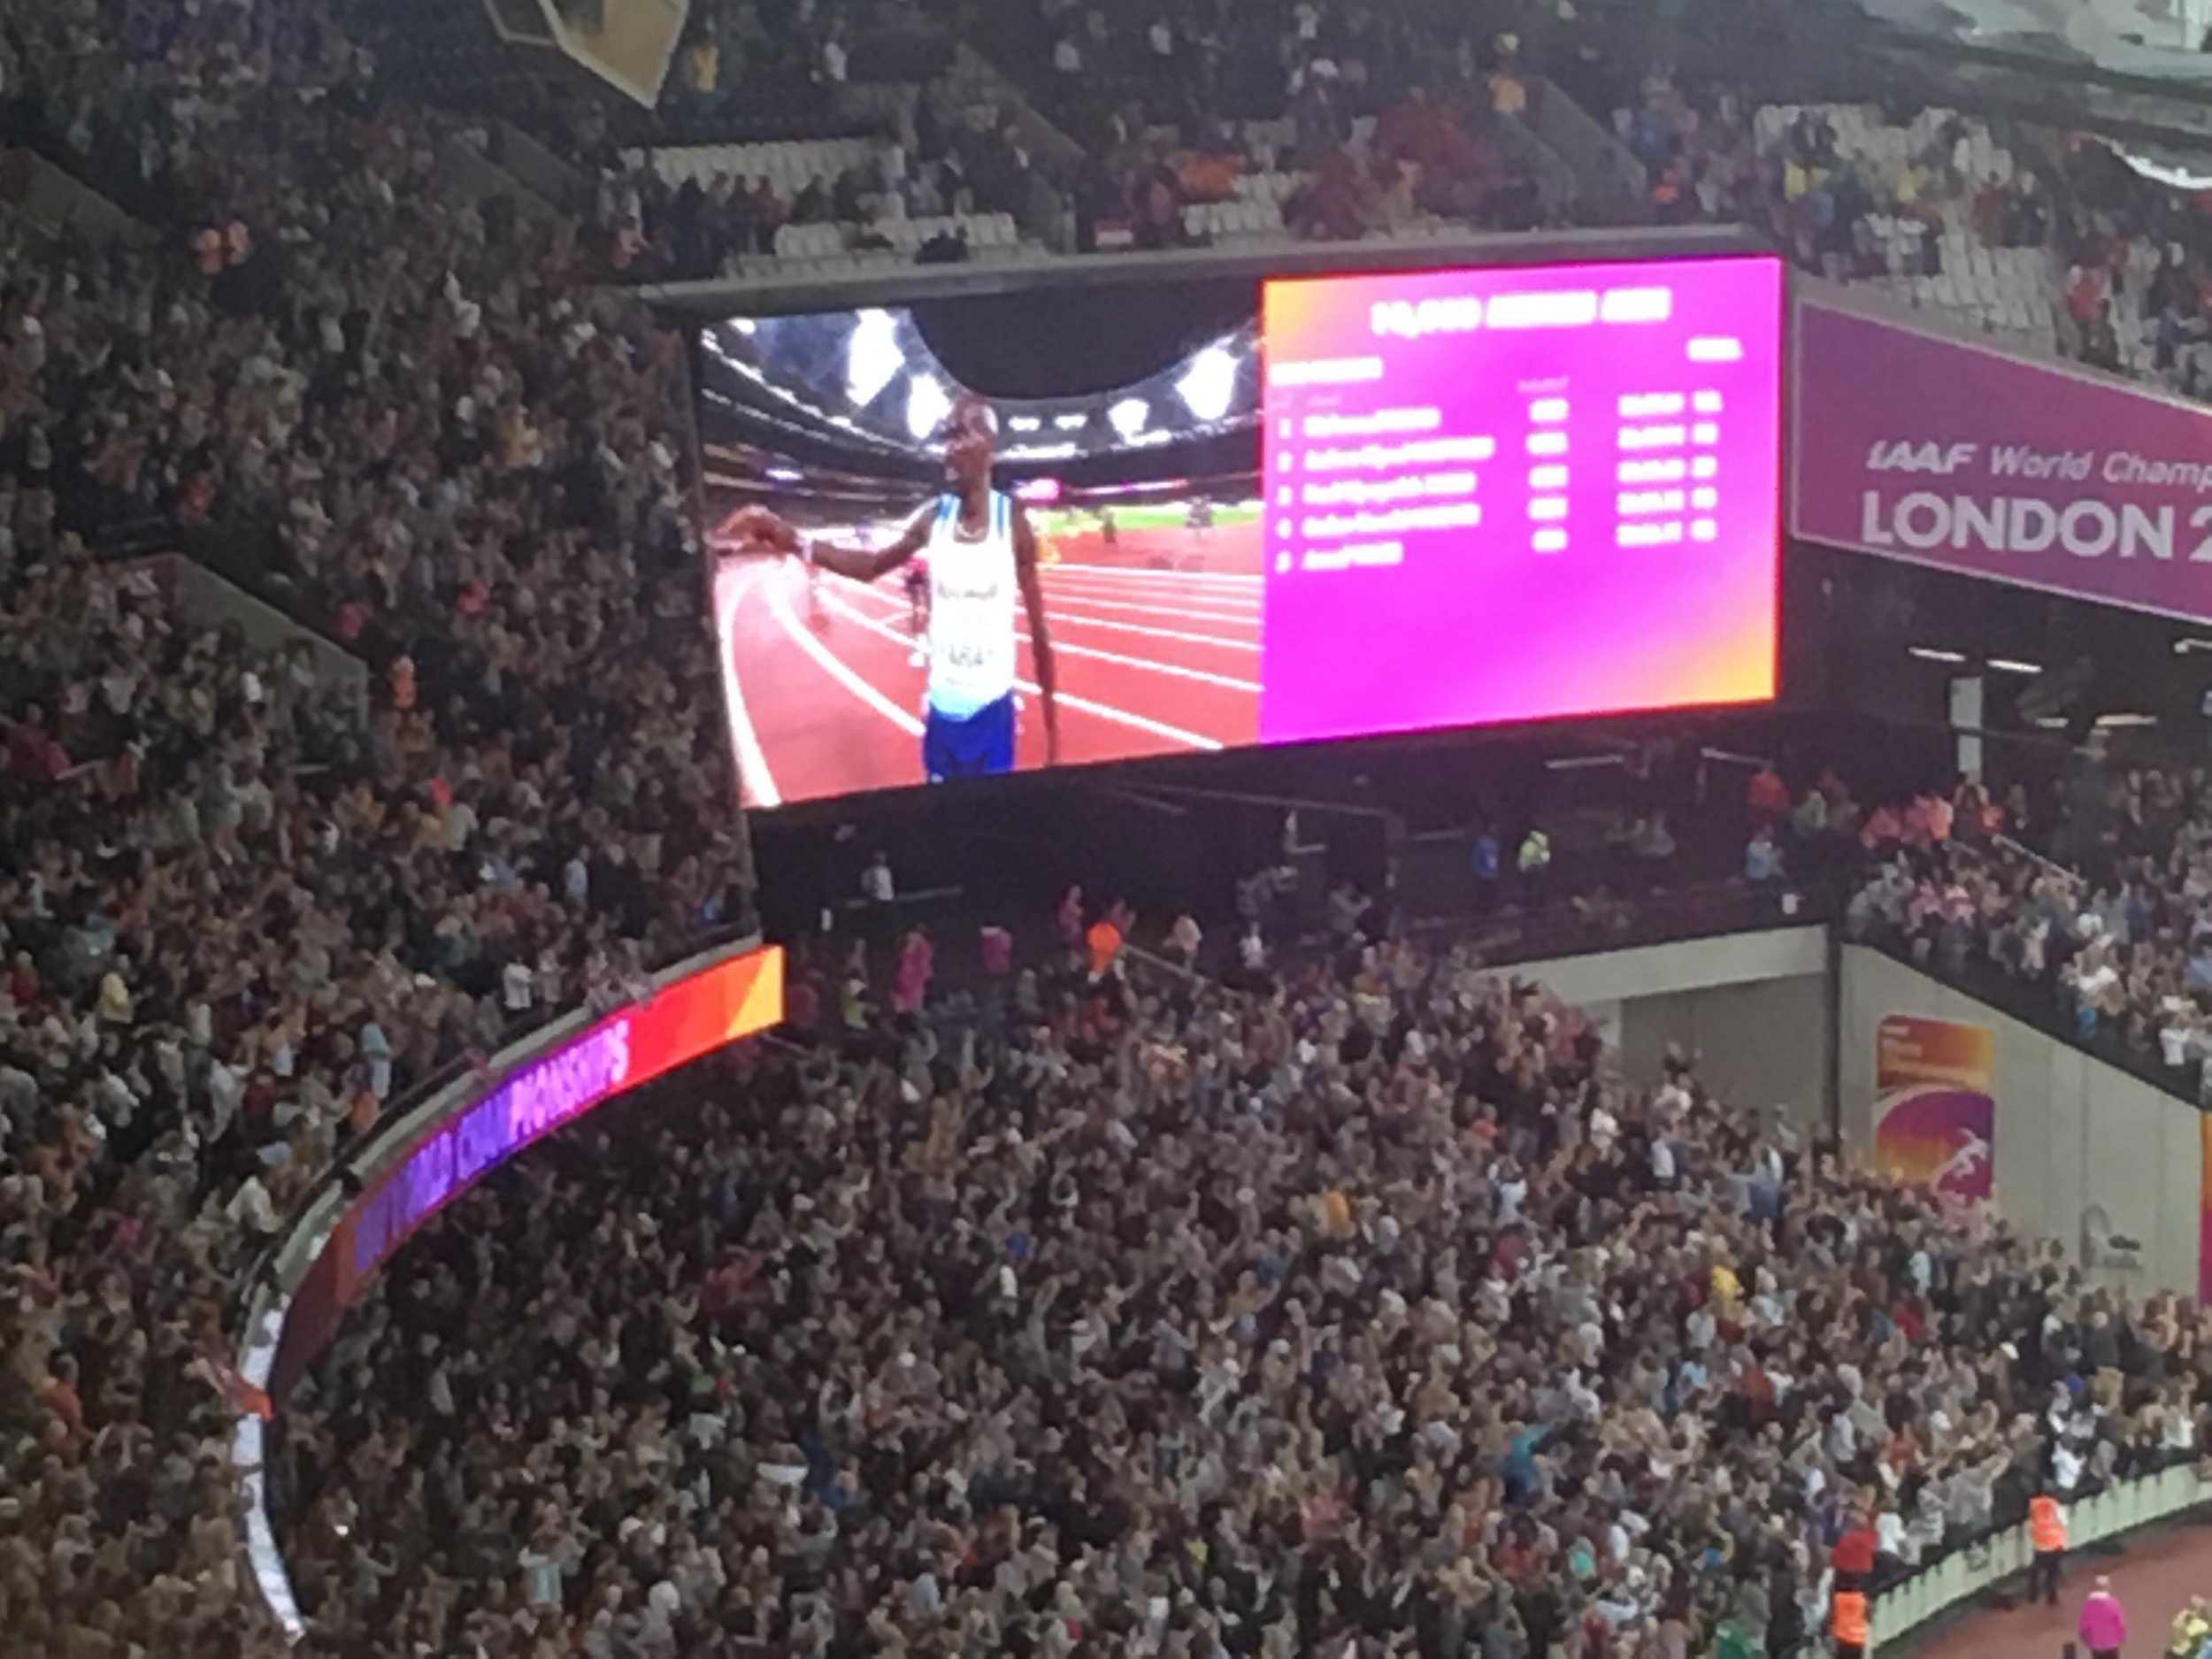 Thunderous crowd glory when he won. I was shaking, throat sore. G.O.A.T.